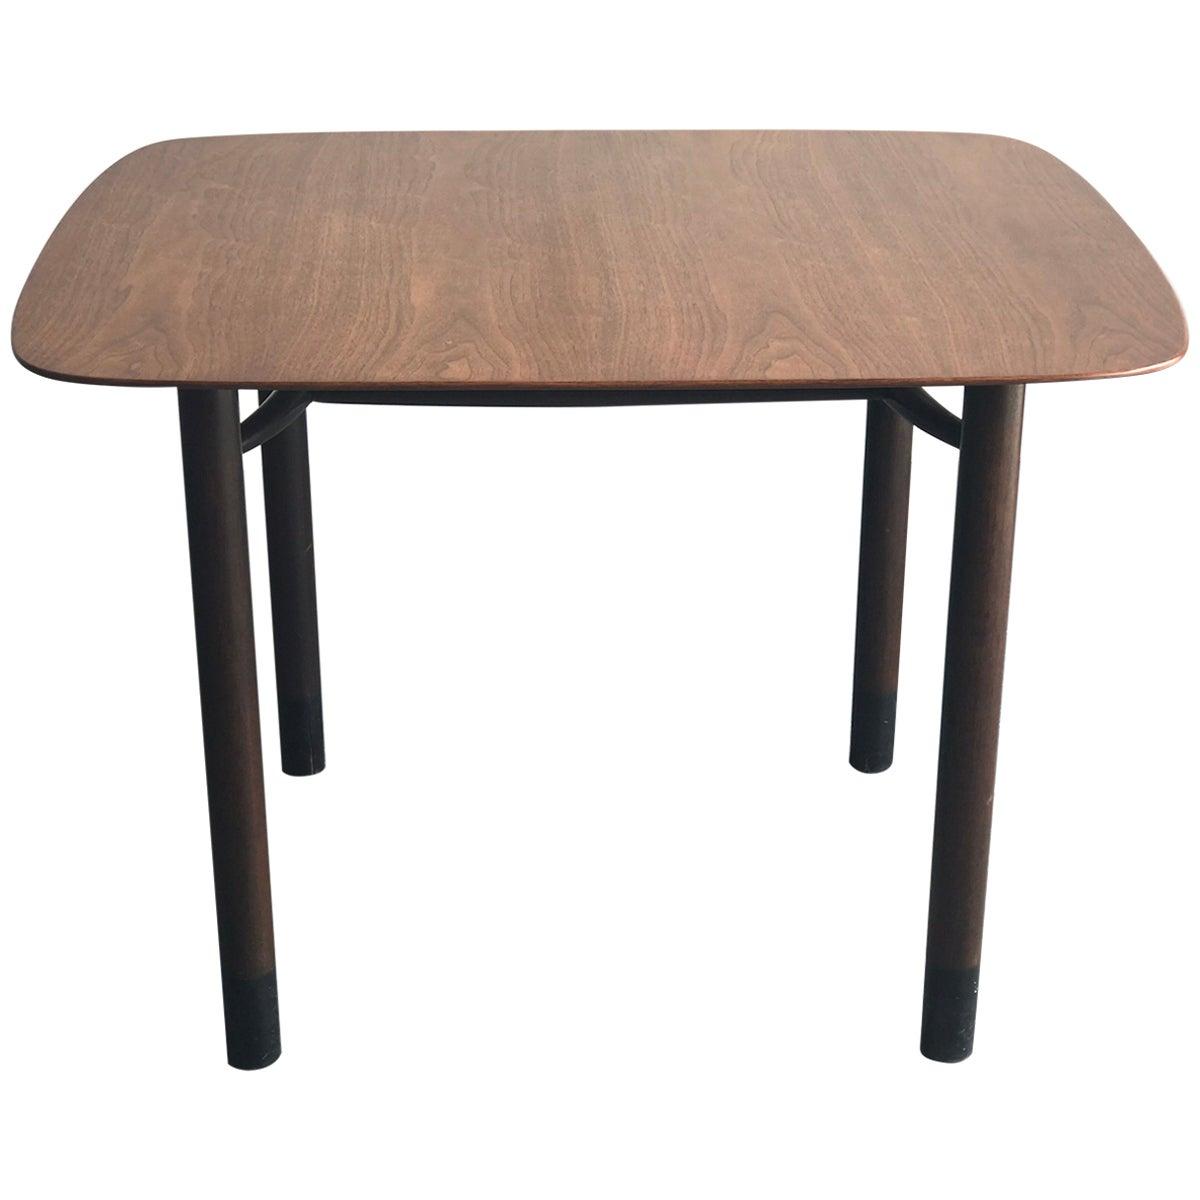 Edward Wormley for Dunbar Petite Dining Table or Desk